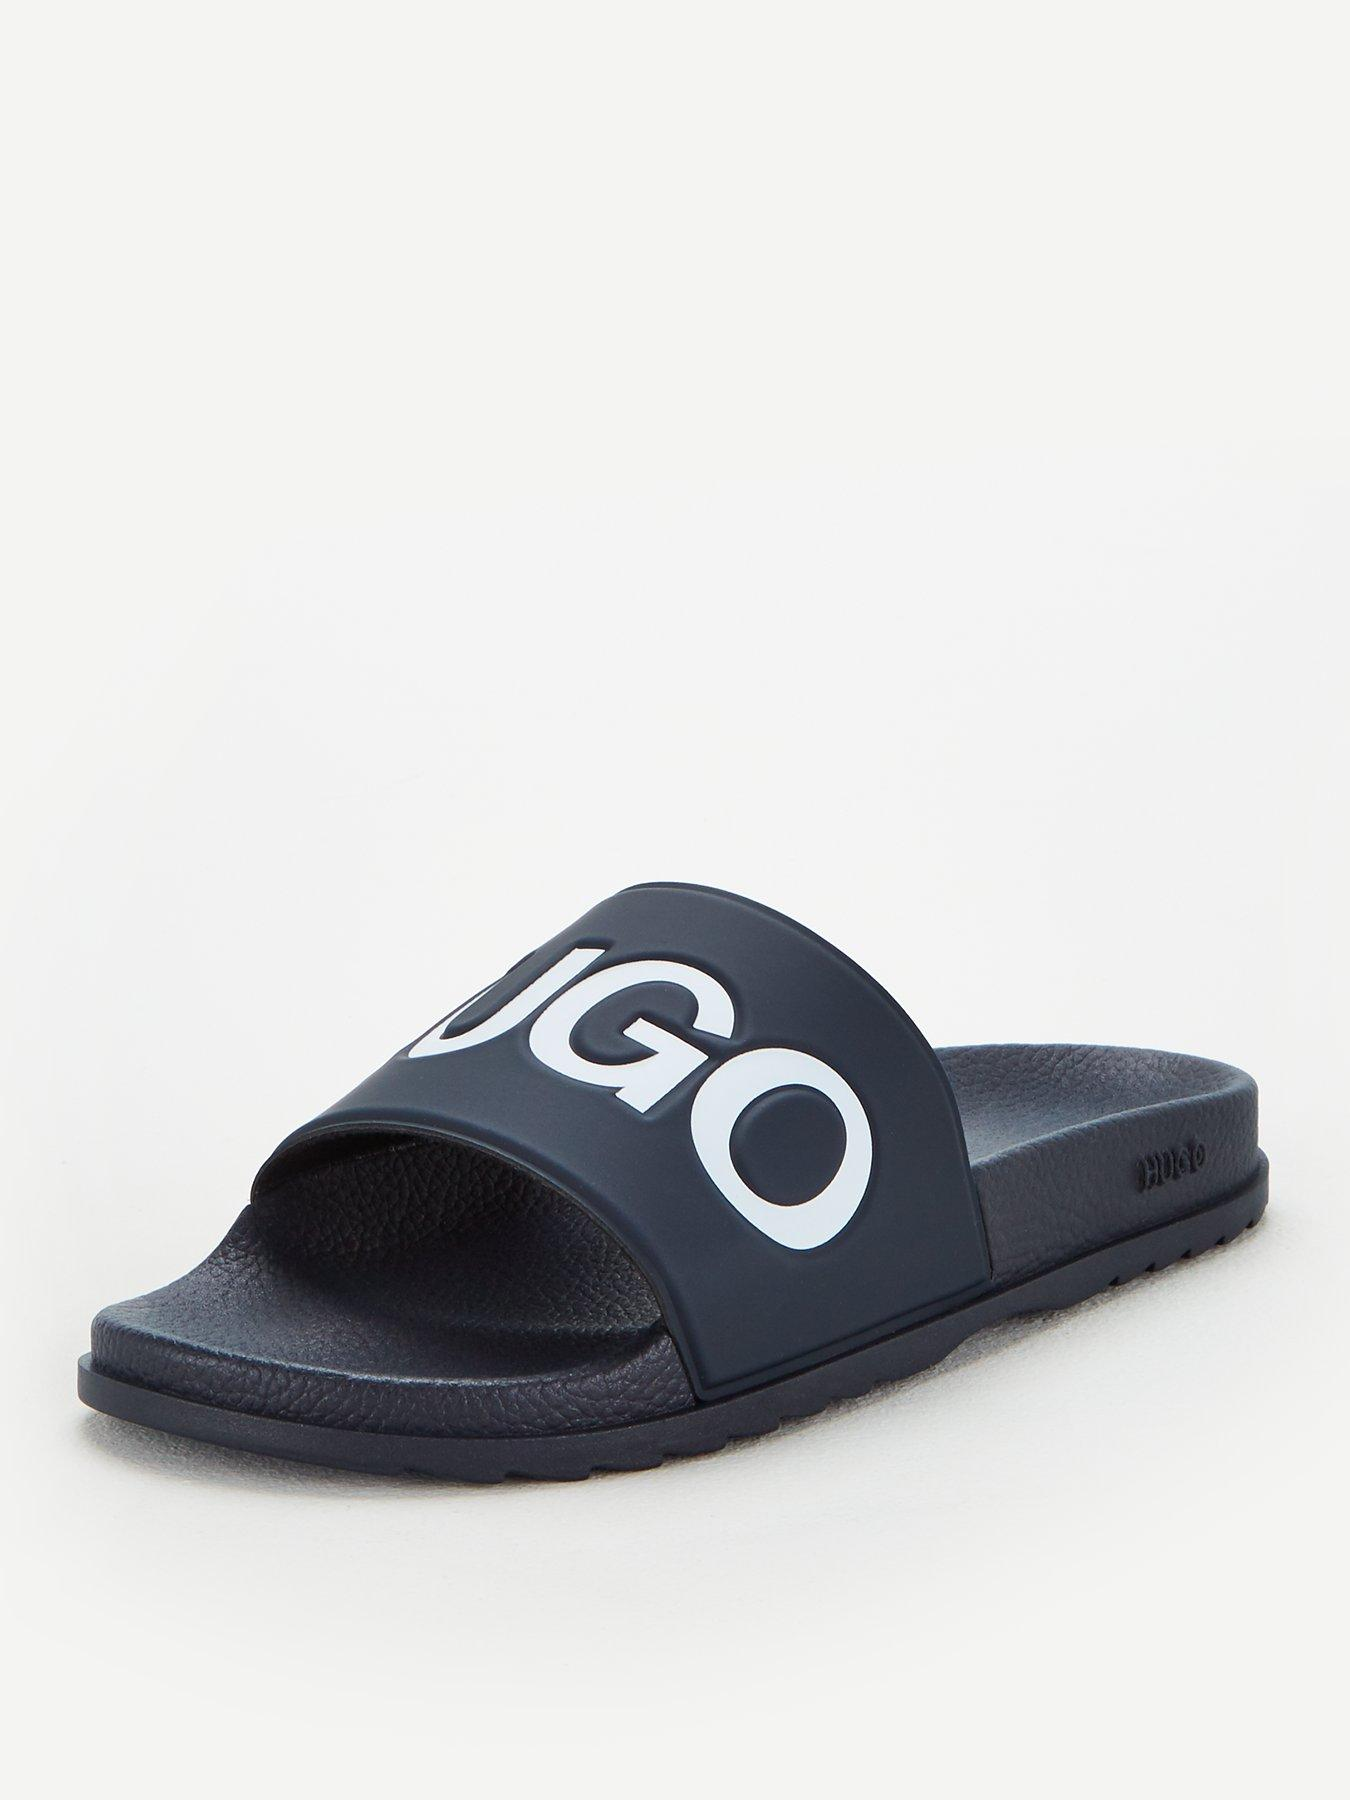 Mens Slip On Sliders Slides Gym Holiday Beach Pool Sandals Flip Flops Size 7-12